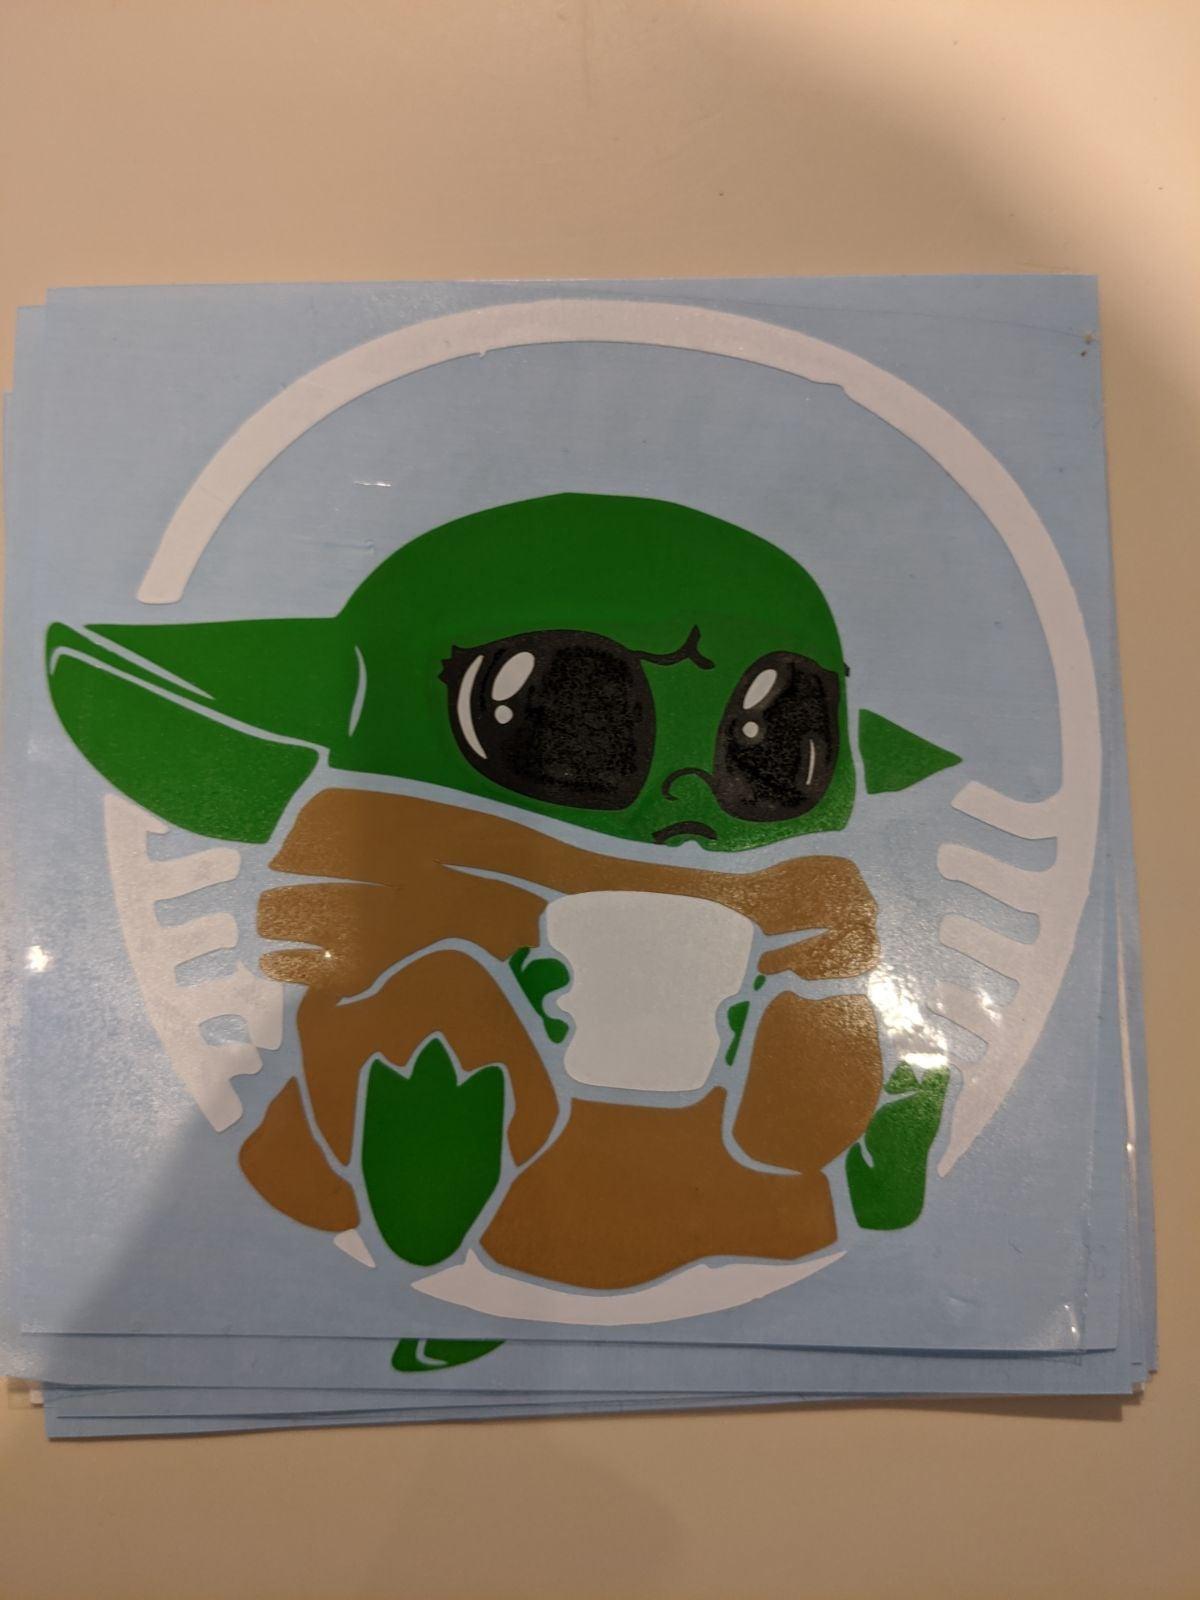 Baby Yoda vinyl decal